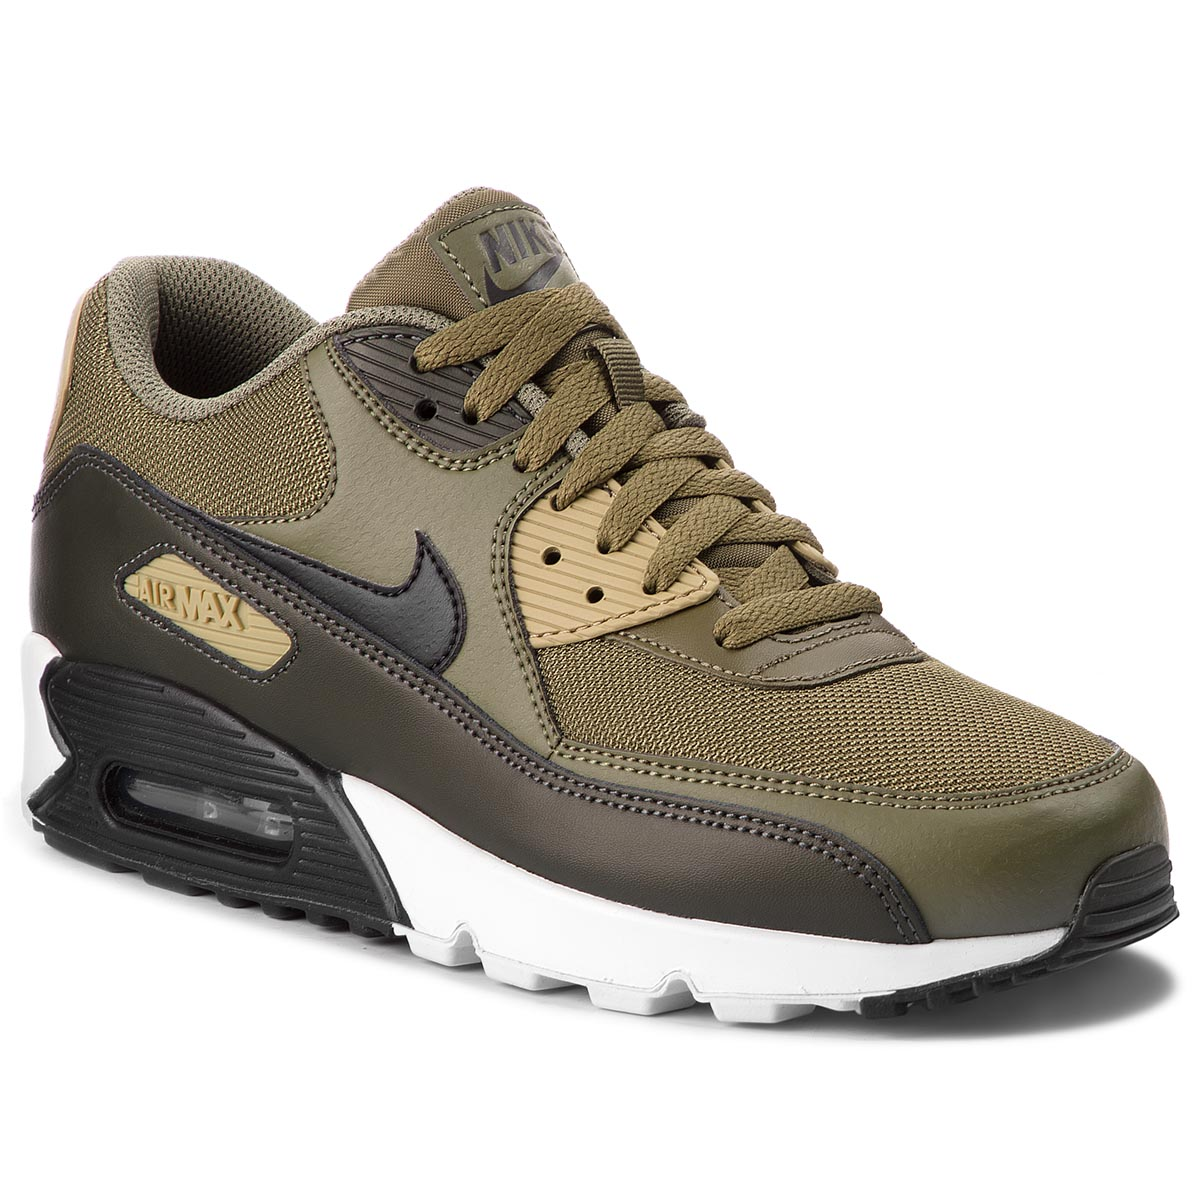 Schuhe NIKE Air Max 90 Essential AJ1285 201 Medium OliveBlackSequoia